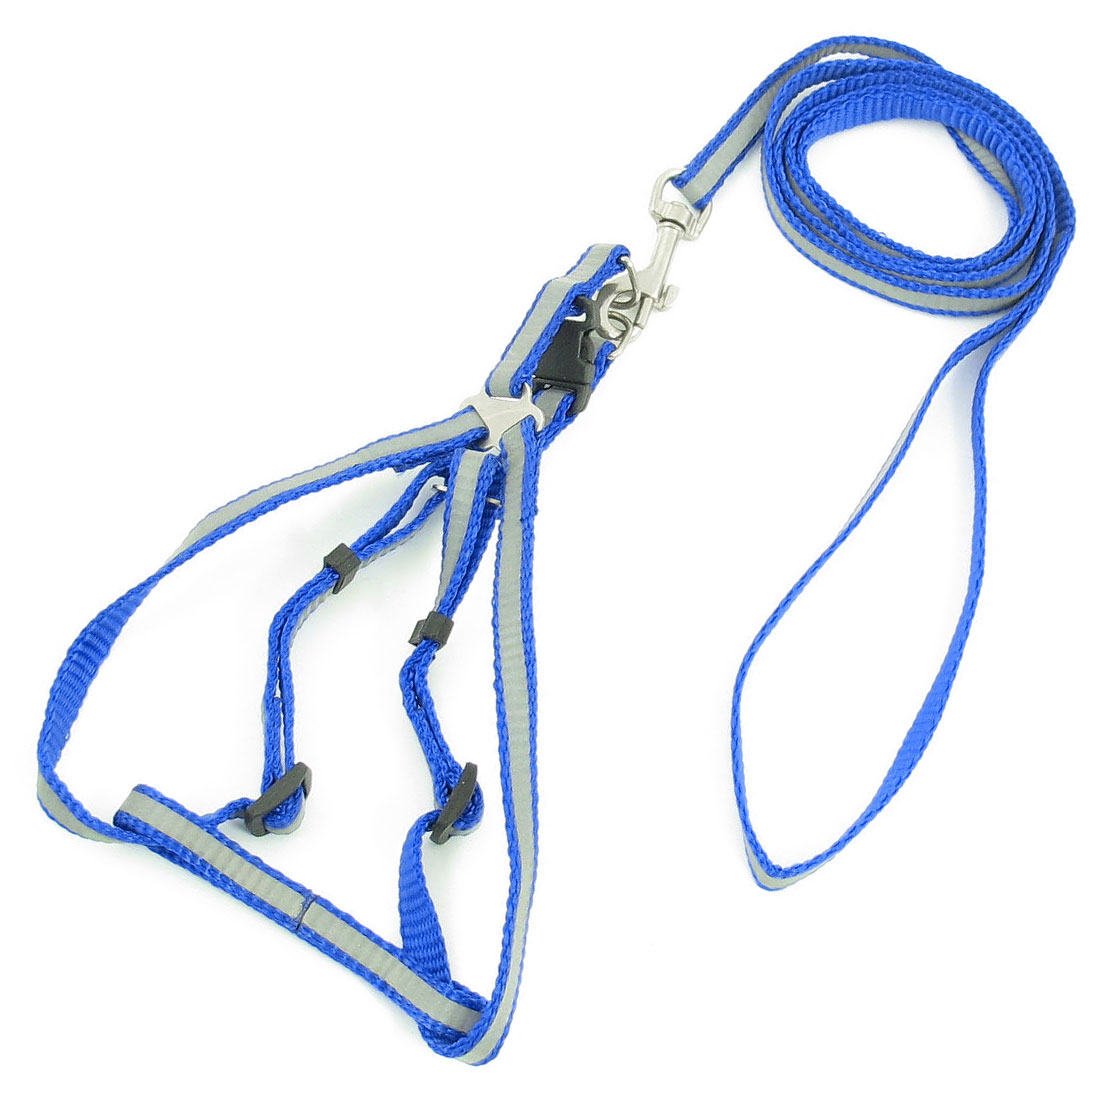 1.2M Lead Nylon Doggie Dog Collar Halter Harness Leash Blue Silver Tone